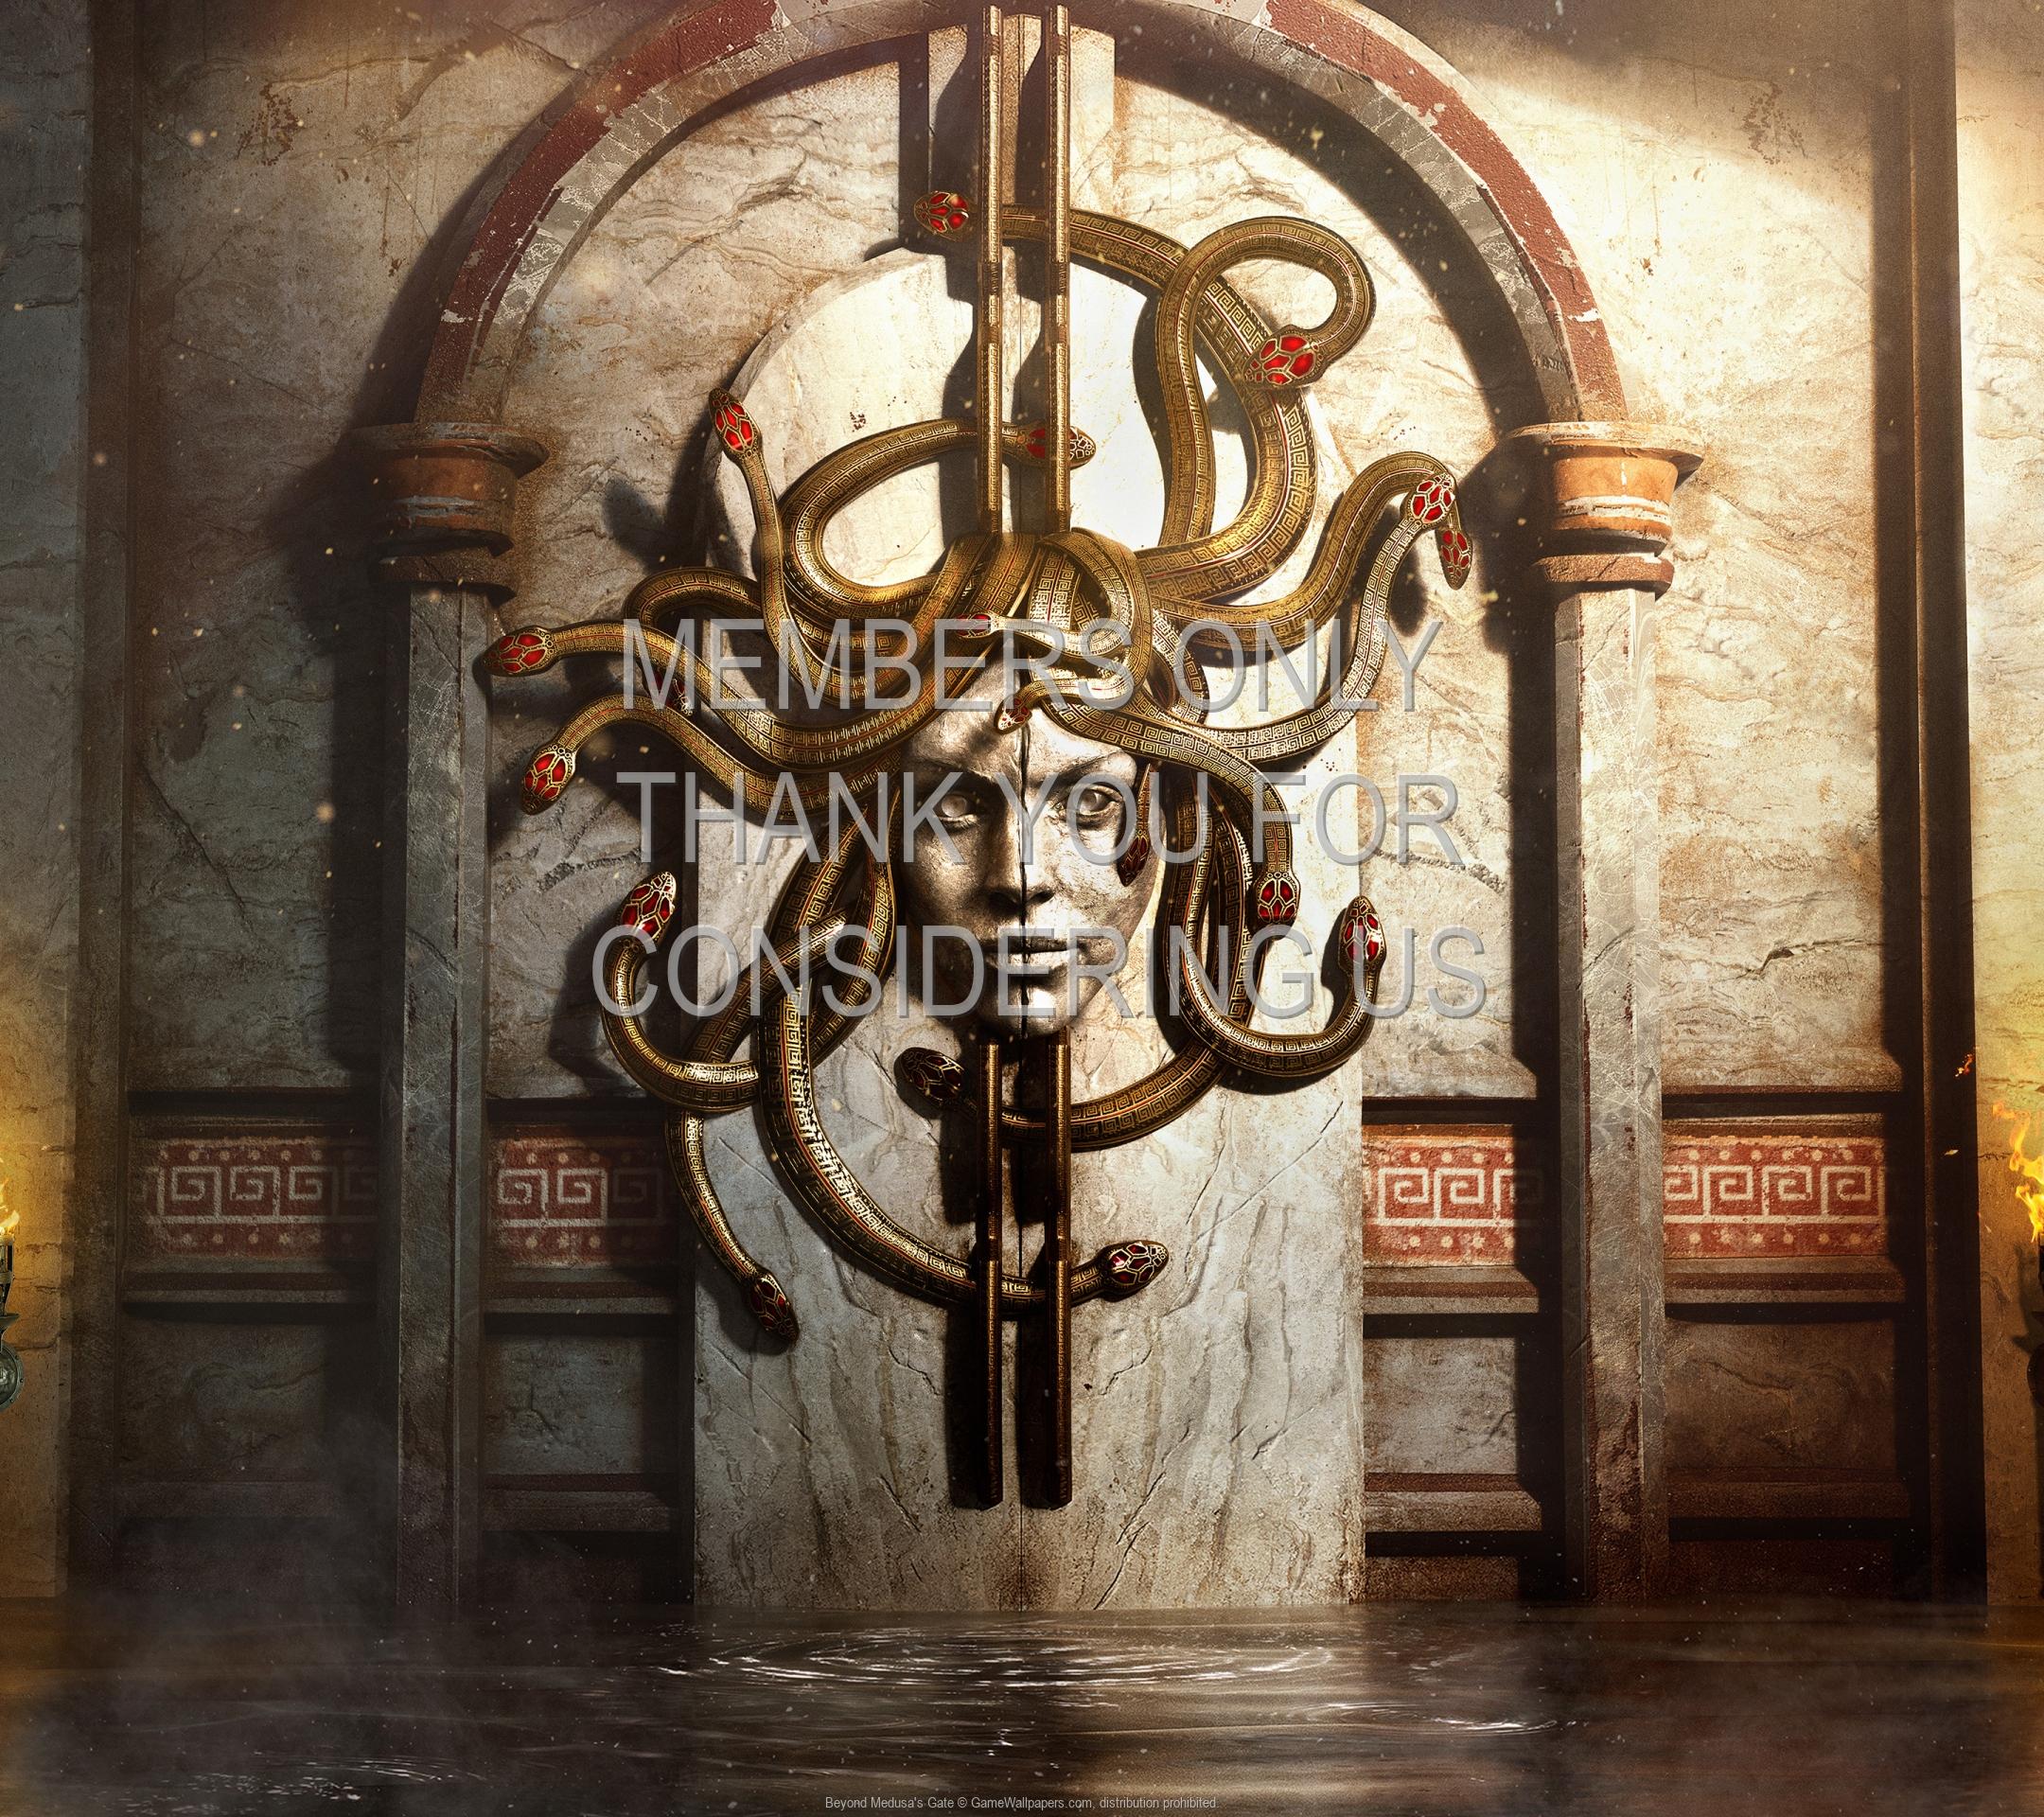 Beyond Medusa's Gate 1920x1080 Handy Hintergrundbild 01